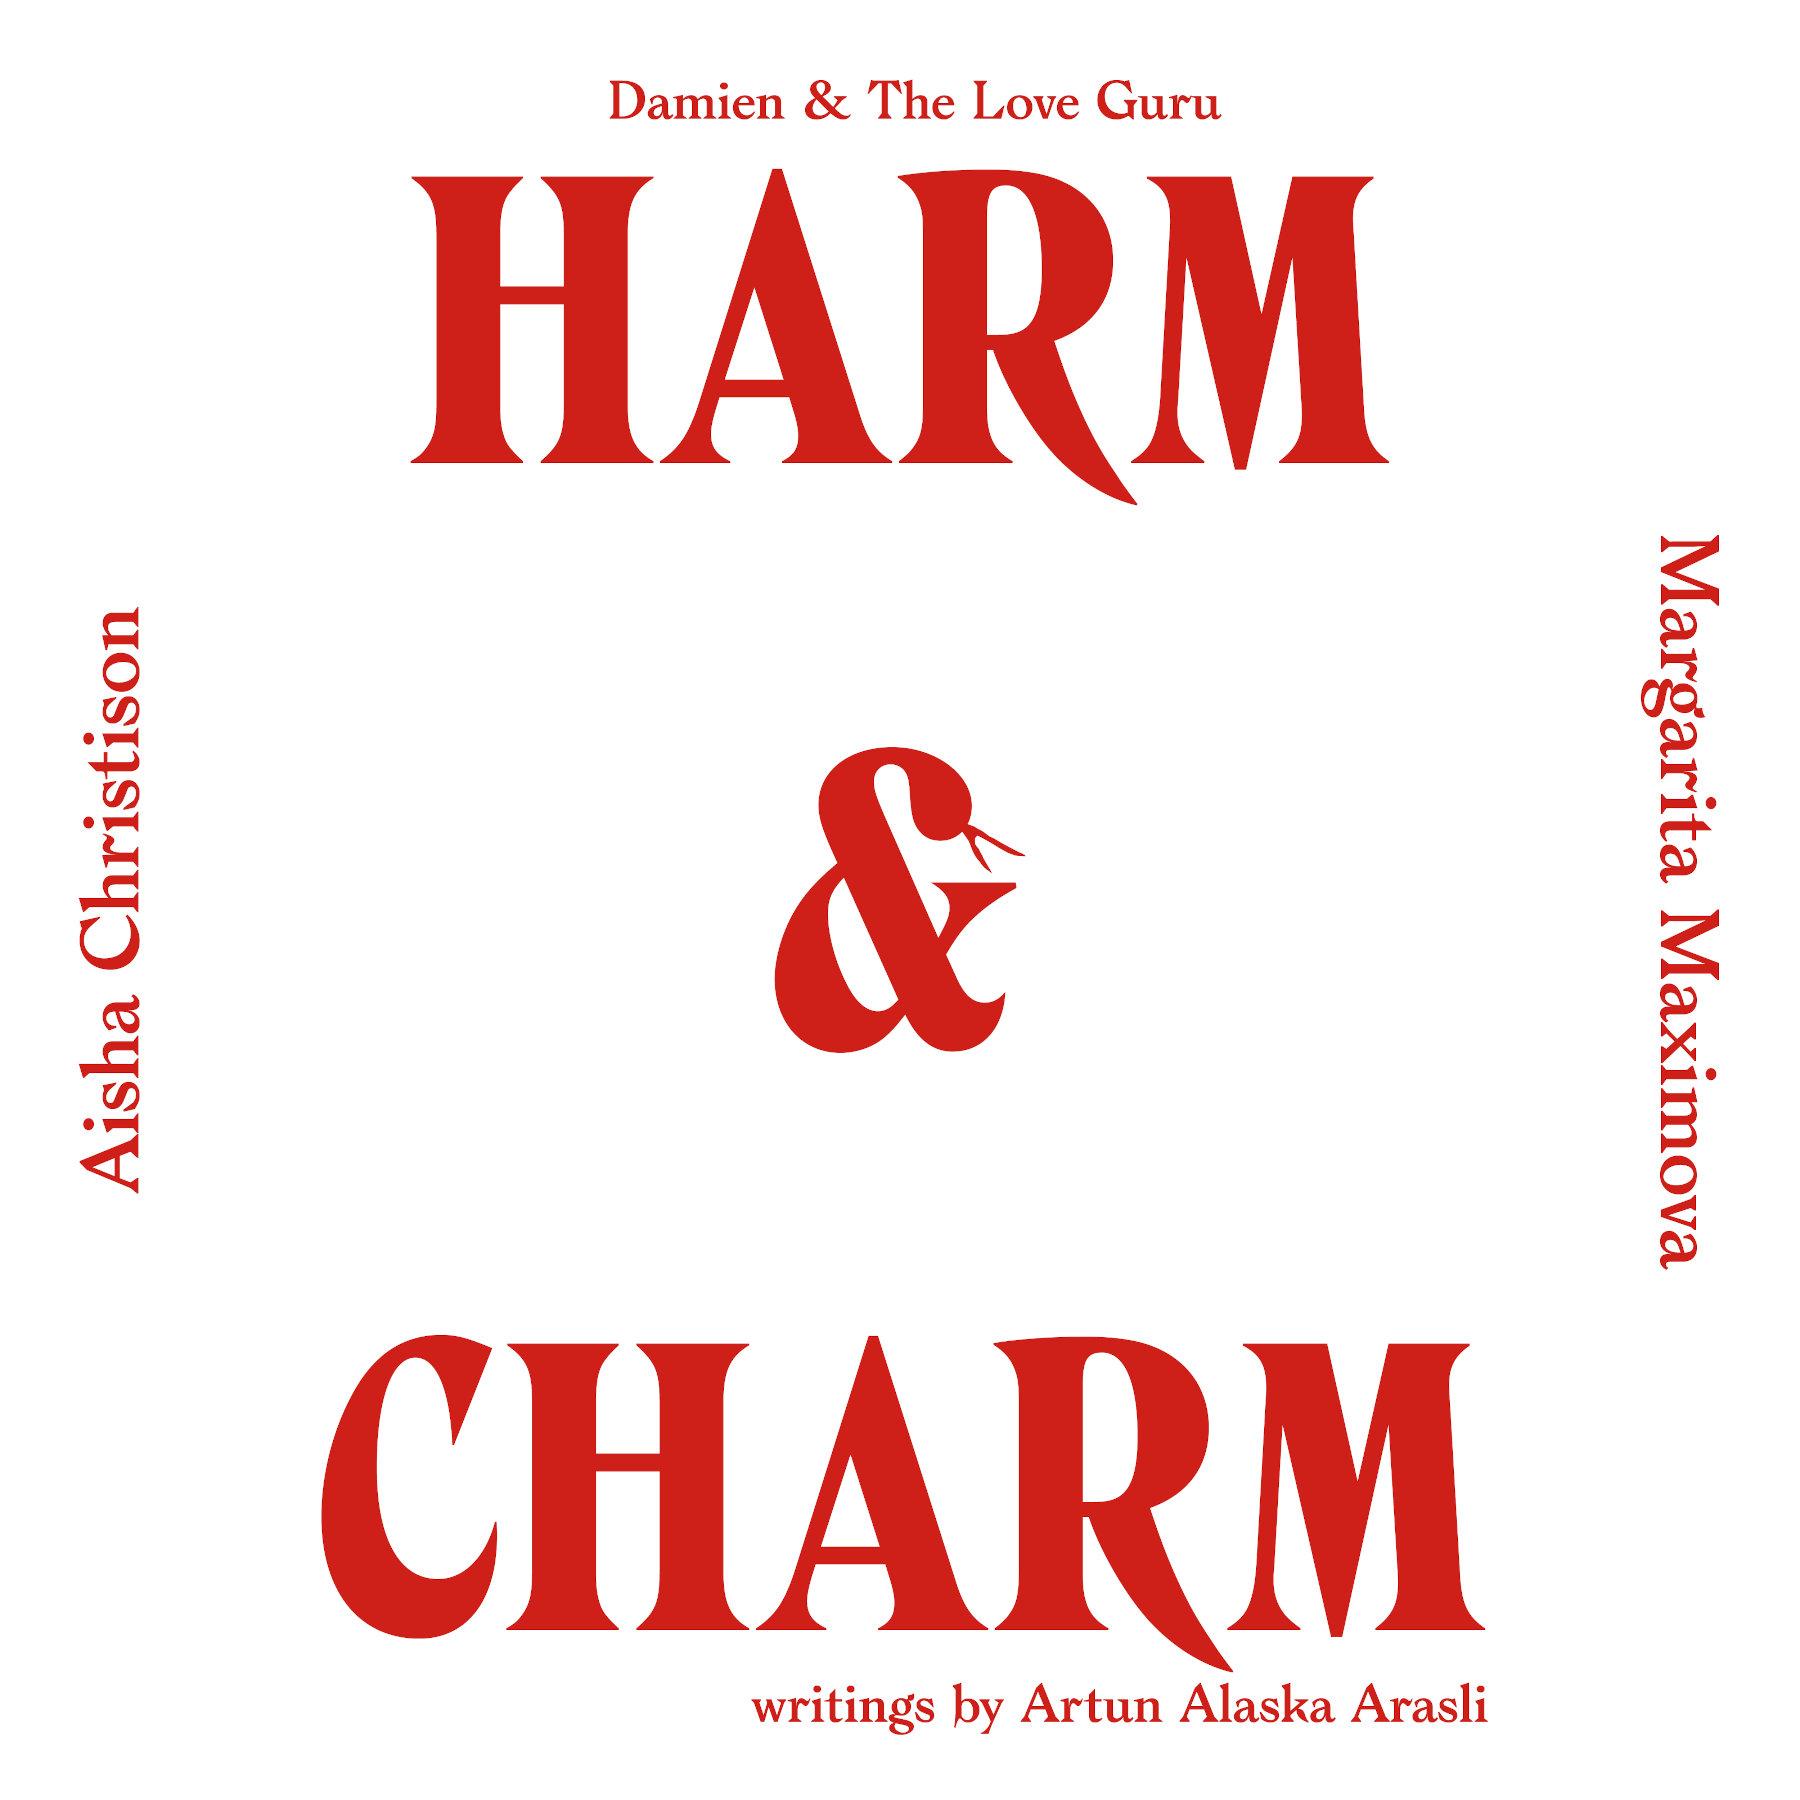 Harm and Charm Damien the Love Guru 2